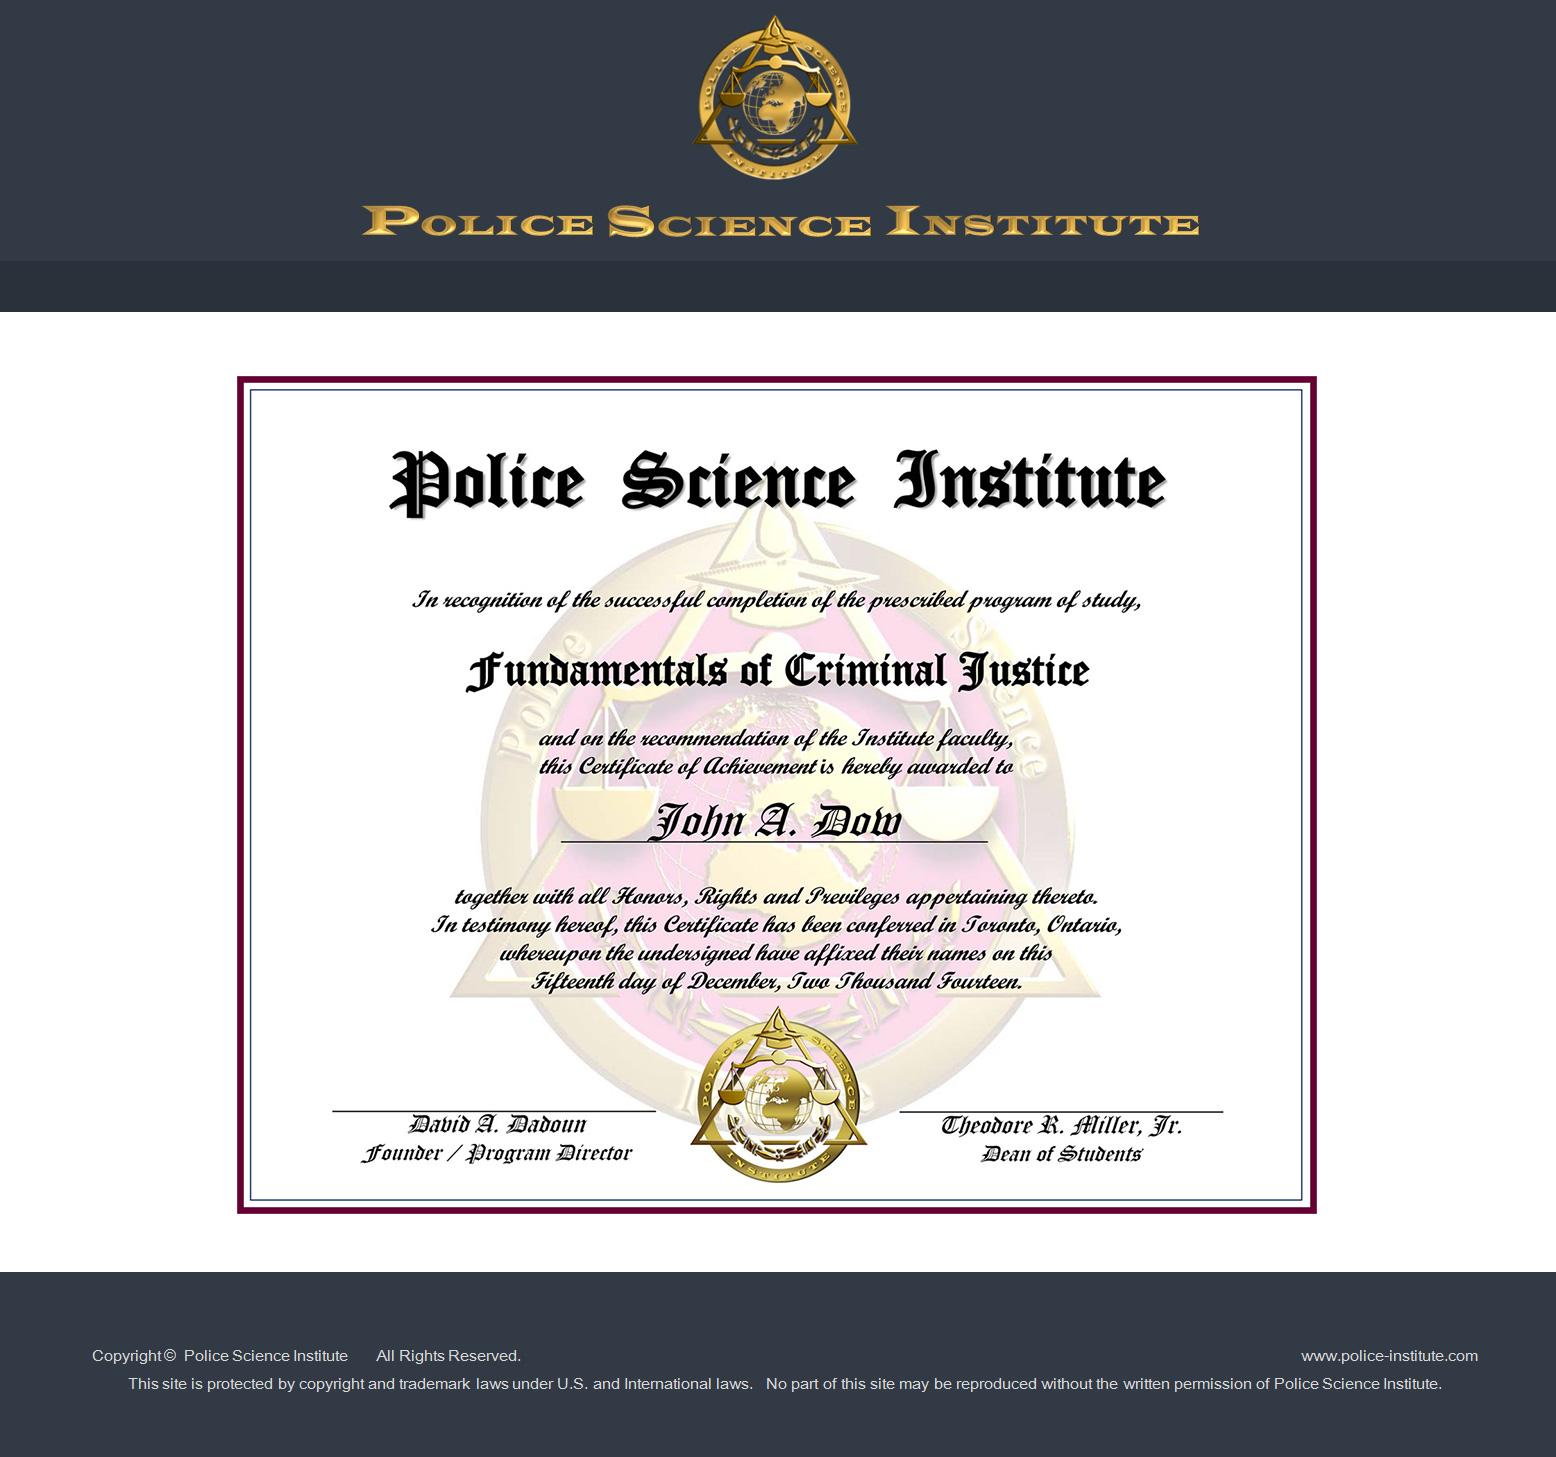 Criminal justice online courses at police science institute x xflitez Images